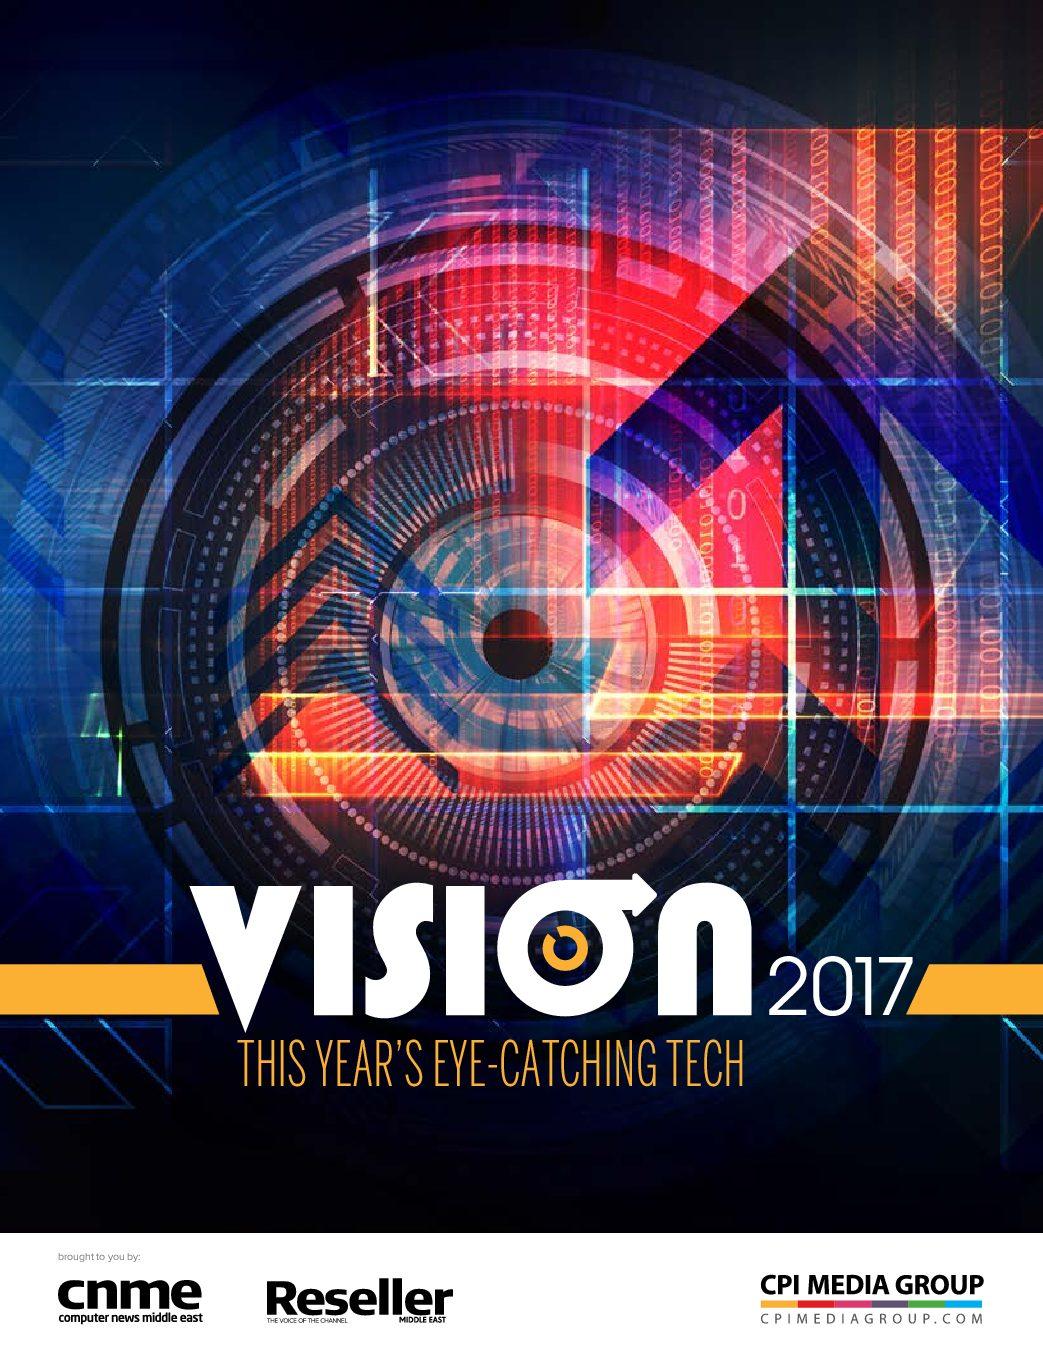 Vision 2017